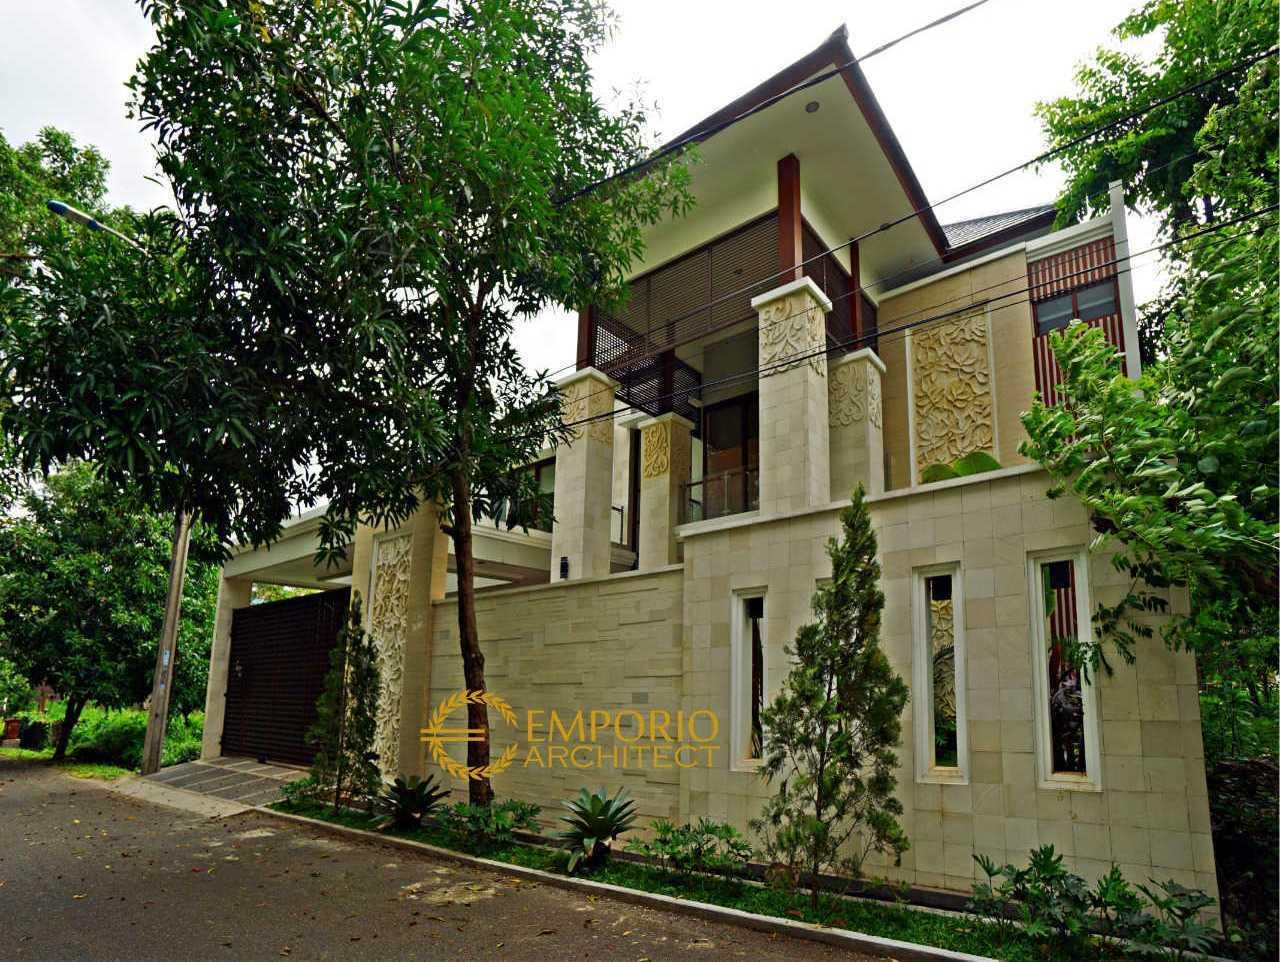 Emporio Architect Jasa Arsitek Cibubur Hasil Konstruksi Rumah Villa Bali Tropis 270 @ Cibubur, Jakarta Timur Cibubur, Kec. Ciracas, Kota Jakarta Timur, Daerah Khusus Ibukota Jakarta, Indonesia Cibubur, Kec. Ciracas, Kota Jakarta Timur, Daerah Khusus Ibukota Jakarta, Indonesia Emporio-Architect-Jasa-Arsitek-Cibubur-Hasil-Konstruksi-Rumah-Villa-Bali-Tropis-270-Cibubur-Jakarta-Timur Tropical 93733